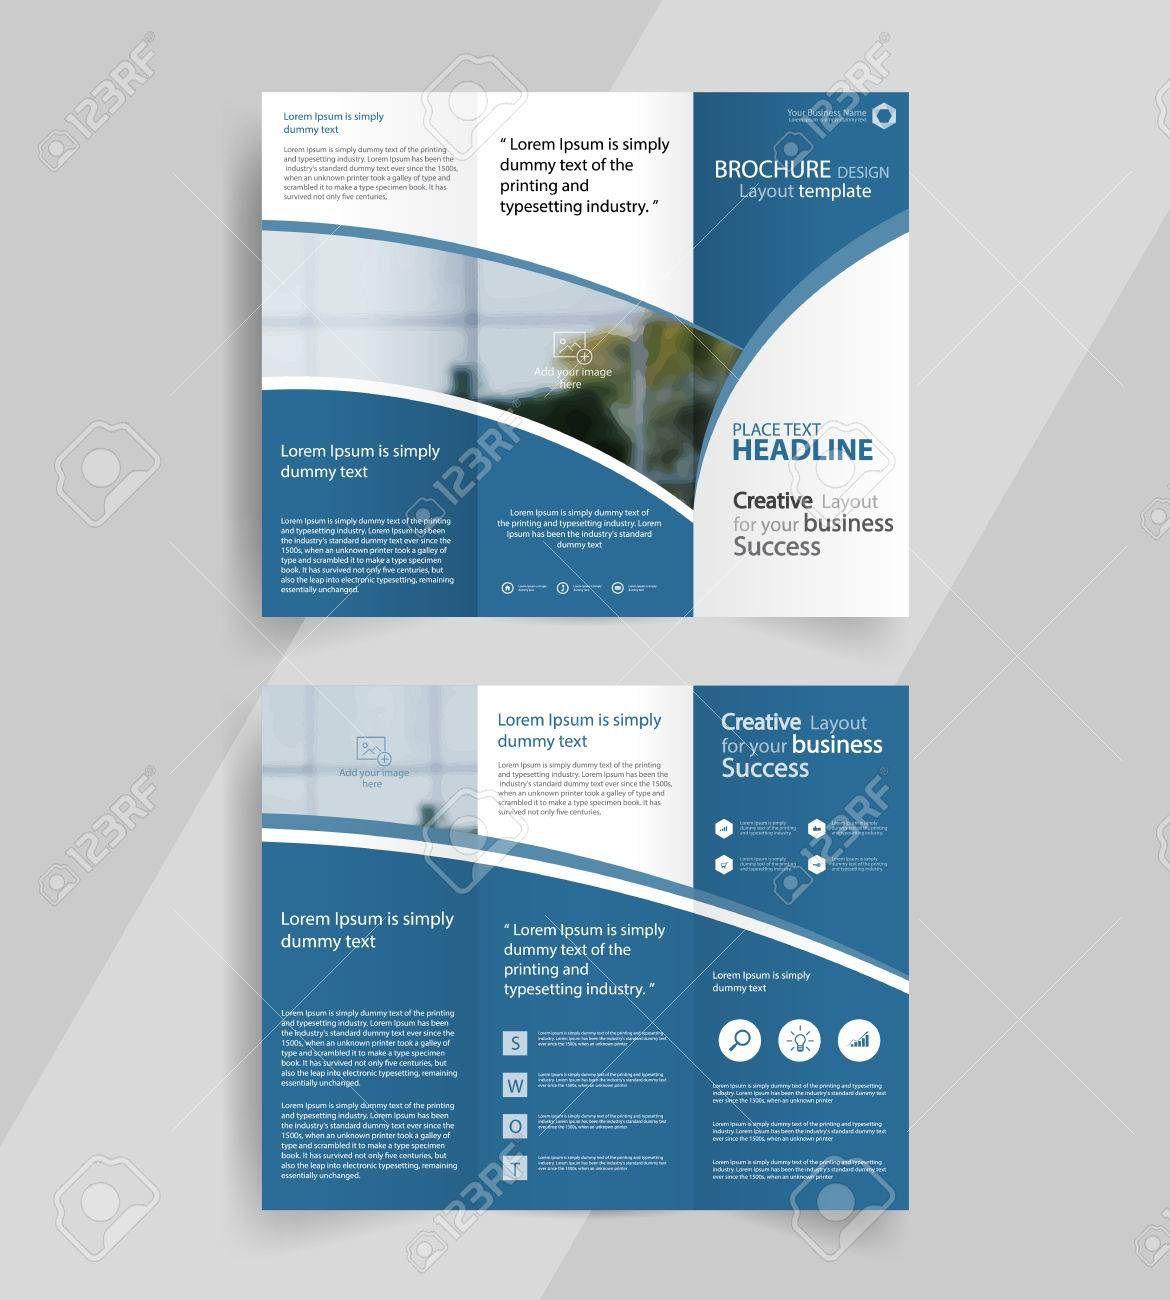 001 Wondrou 3 Fold Brochure Template High Def  Templates For FreeFull